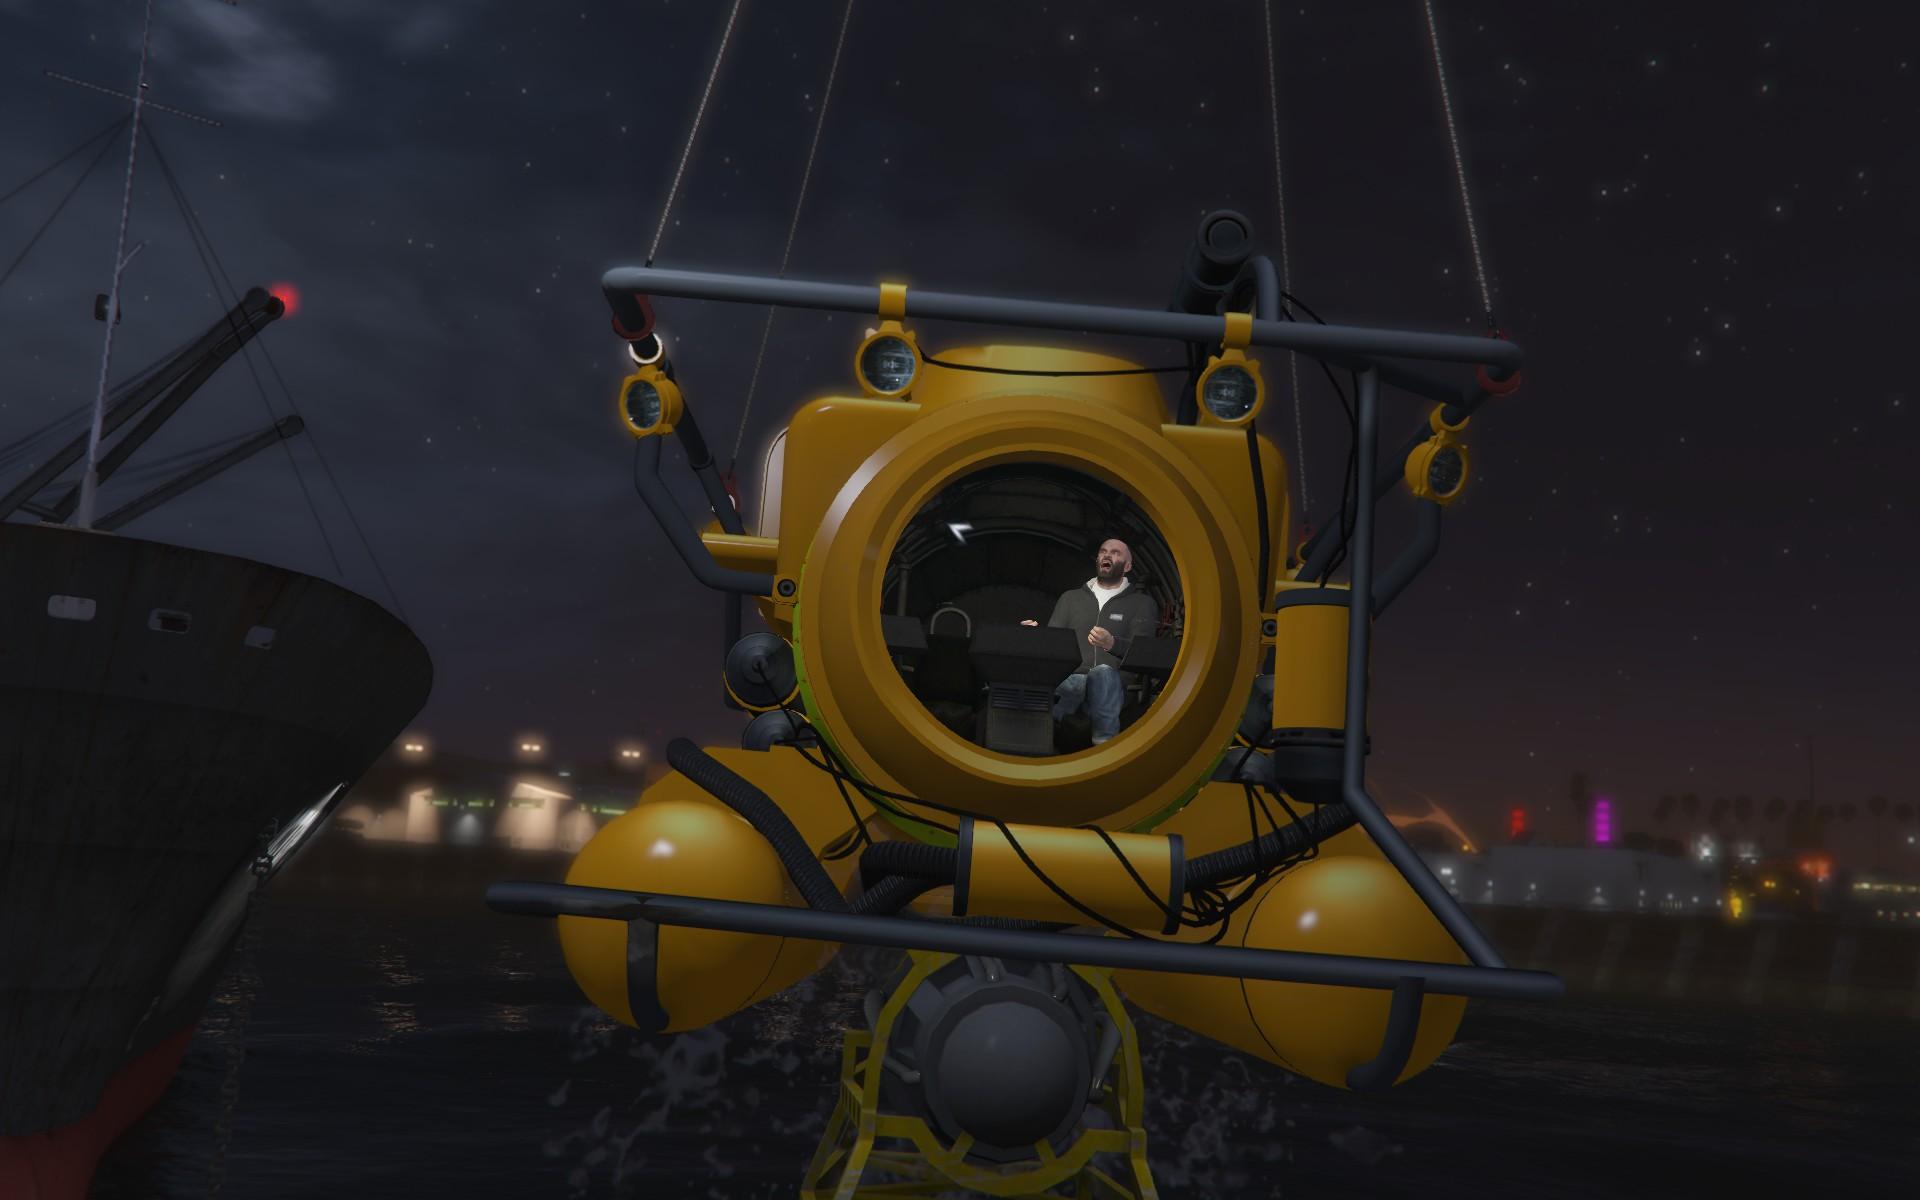 ограбление мерриуэзер - Grand Theft Auto 5 submarine, trevor philips